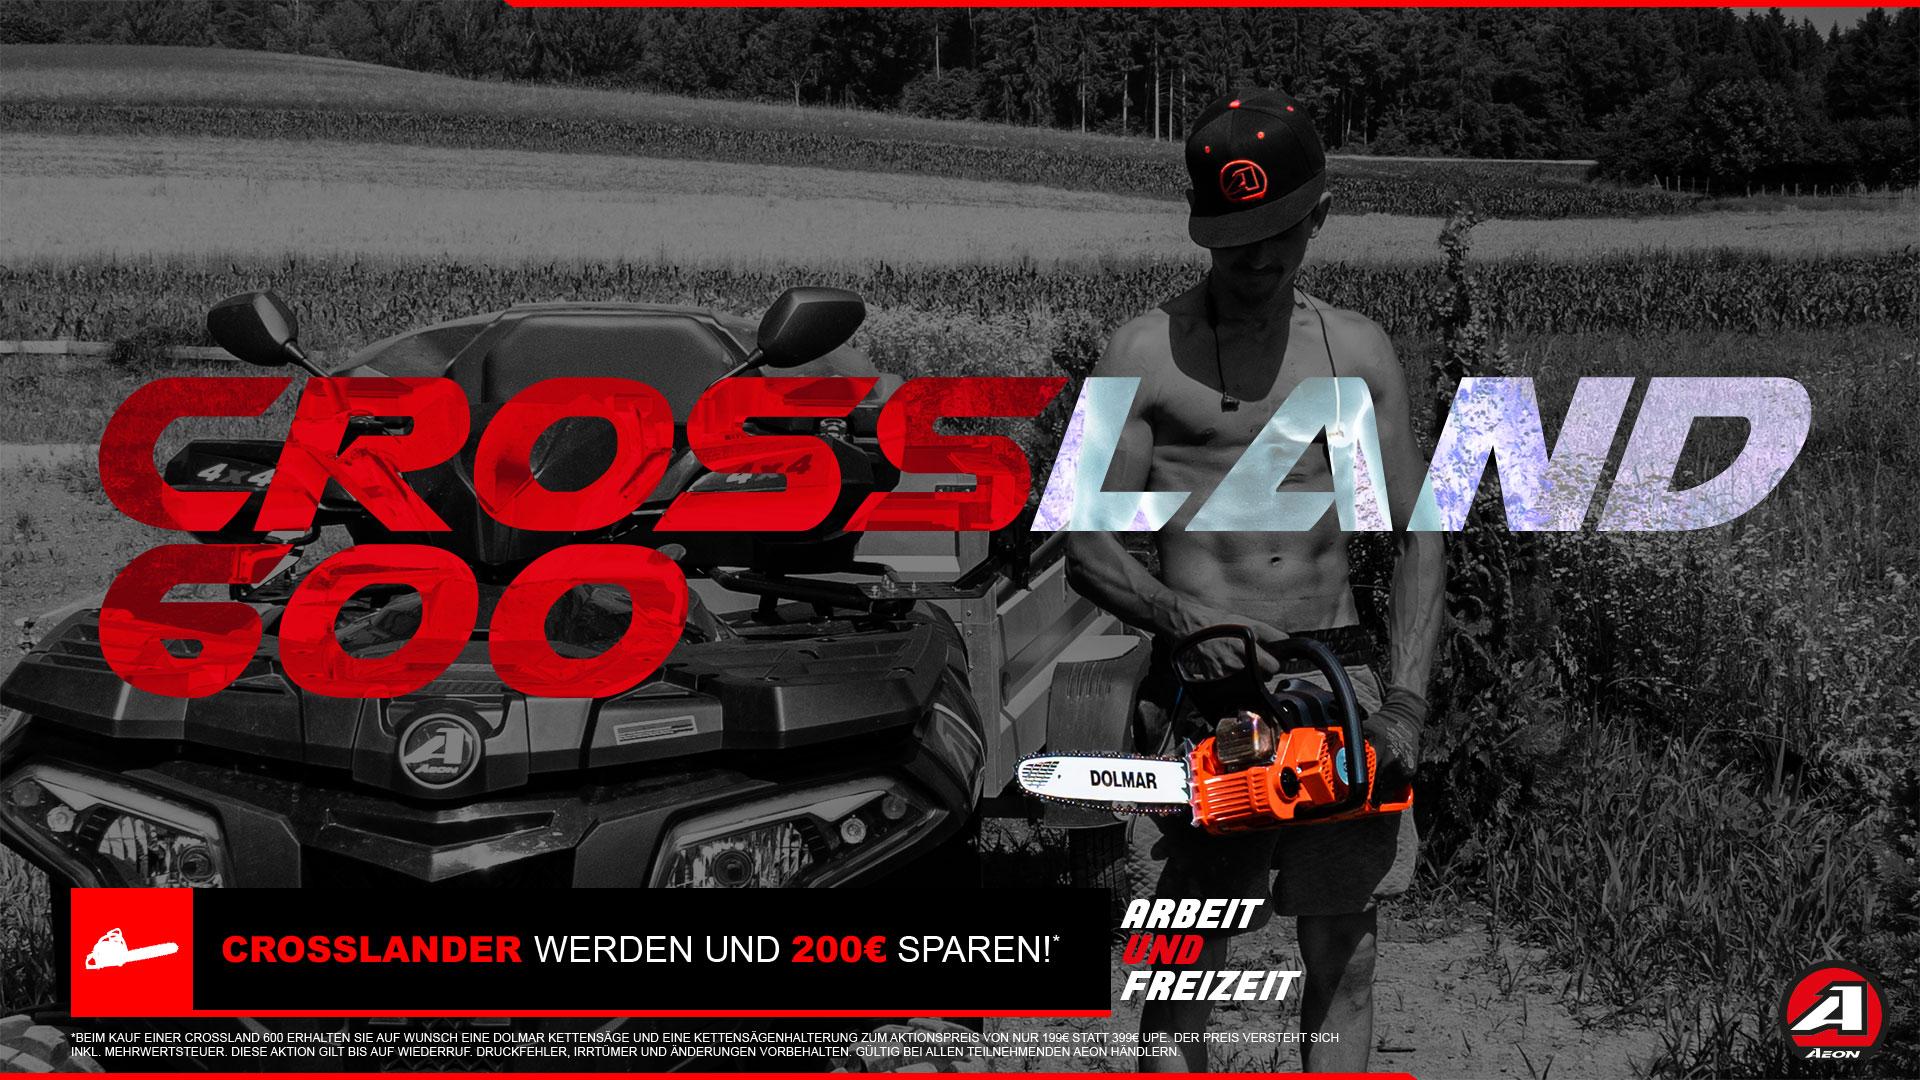 Crossland-600-Dolmar-Kettensäge